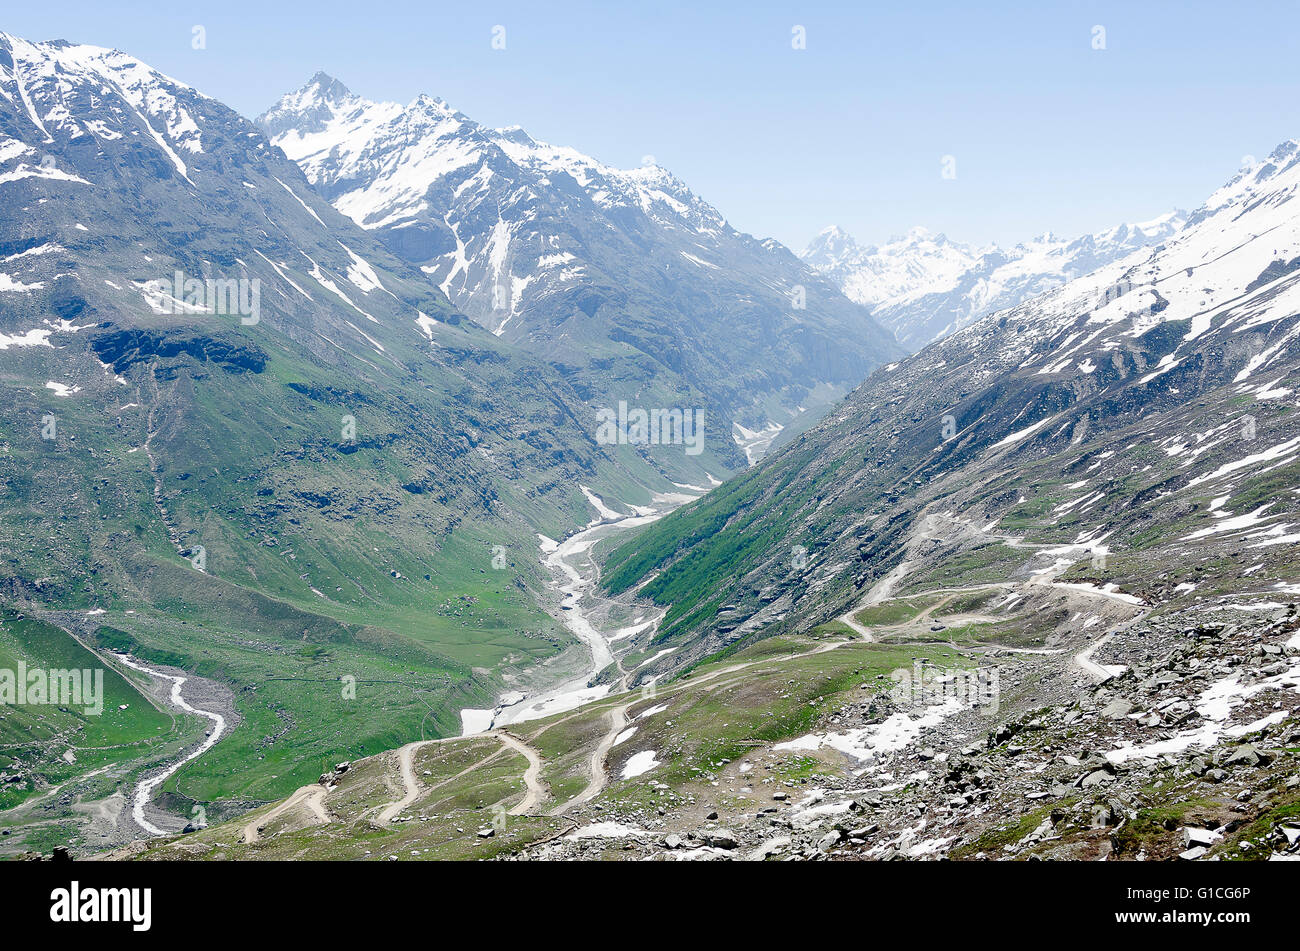 Road on northern side of Rotang Pass, Manali - Leh Road, Himachal Pradesh, India, - Stock Image